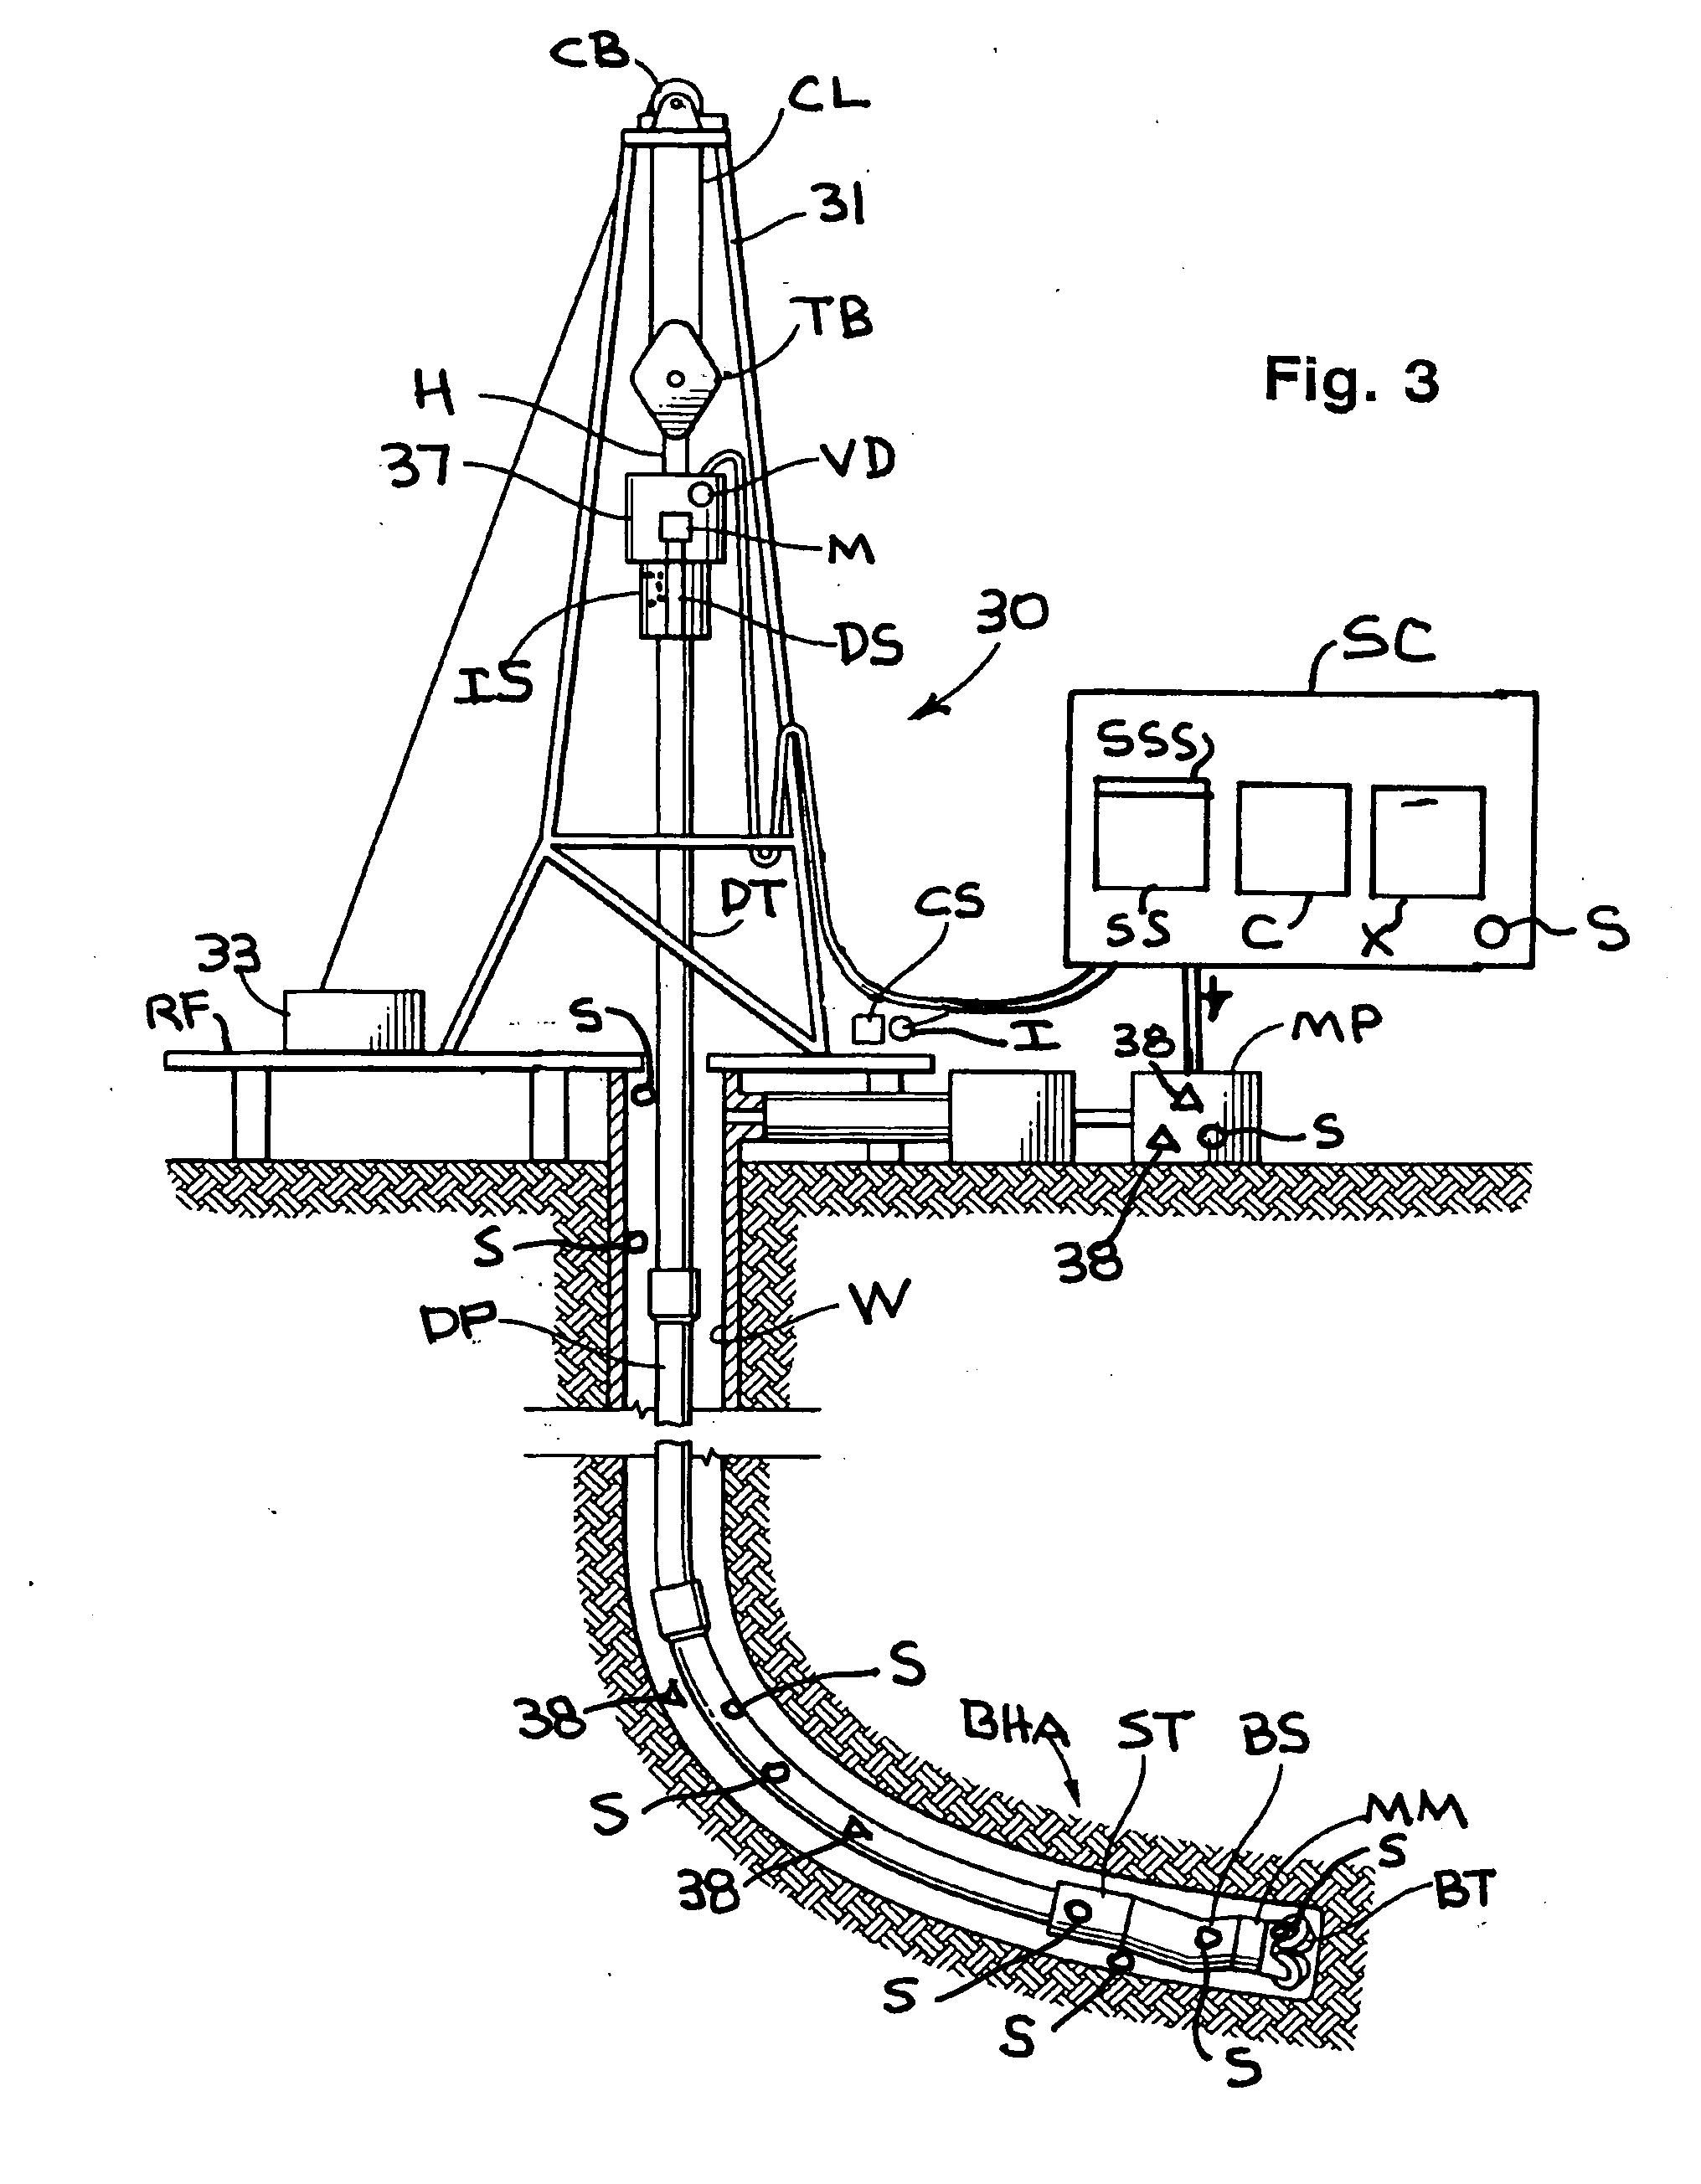 Oilfield Wiring Diagrams : Oilfield pump jack diagram imageresizertool